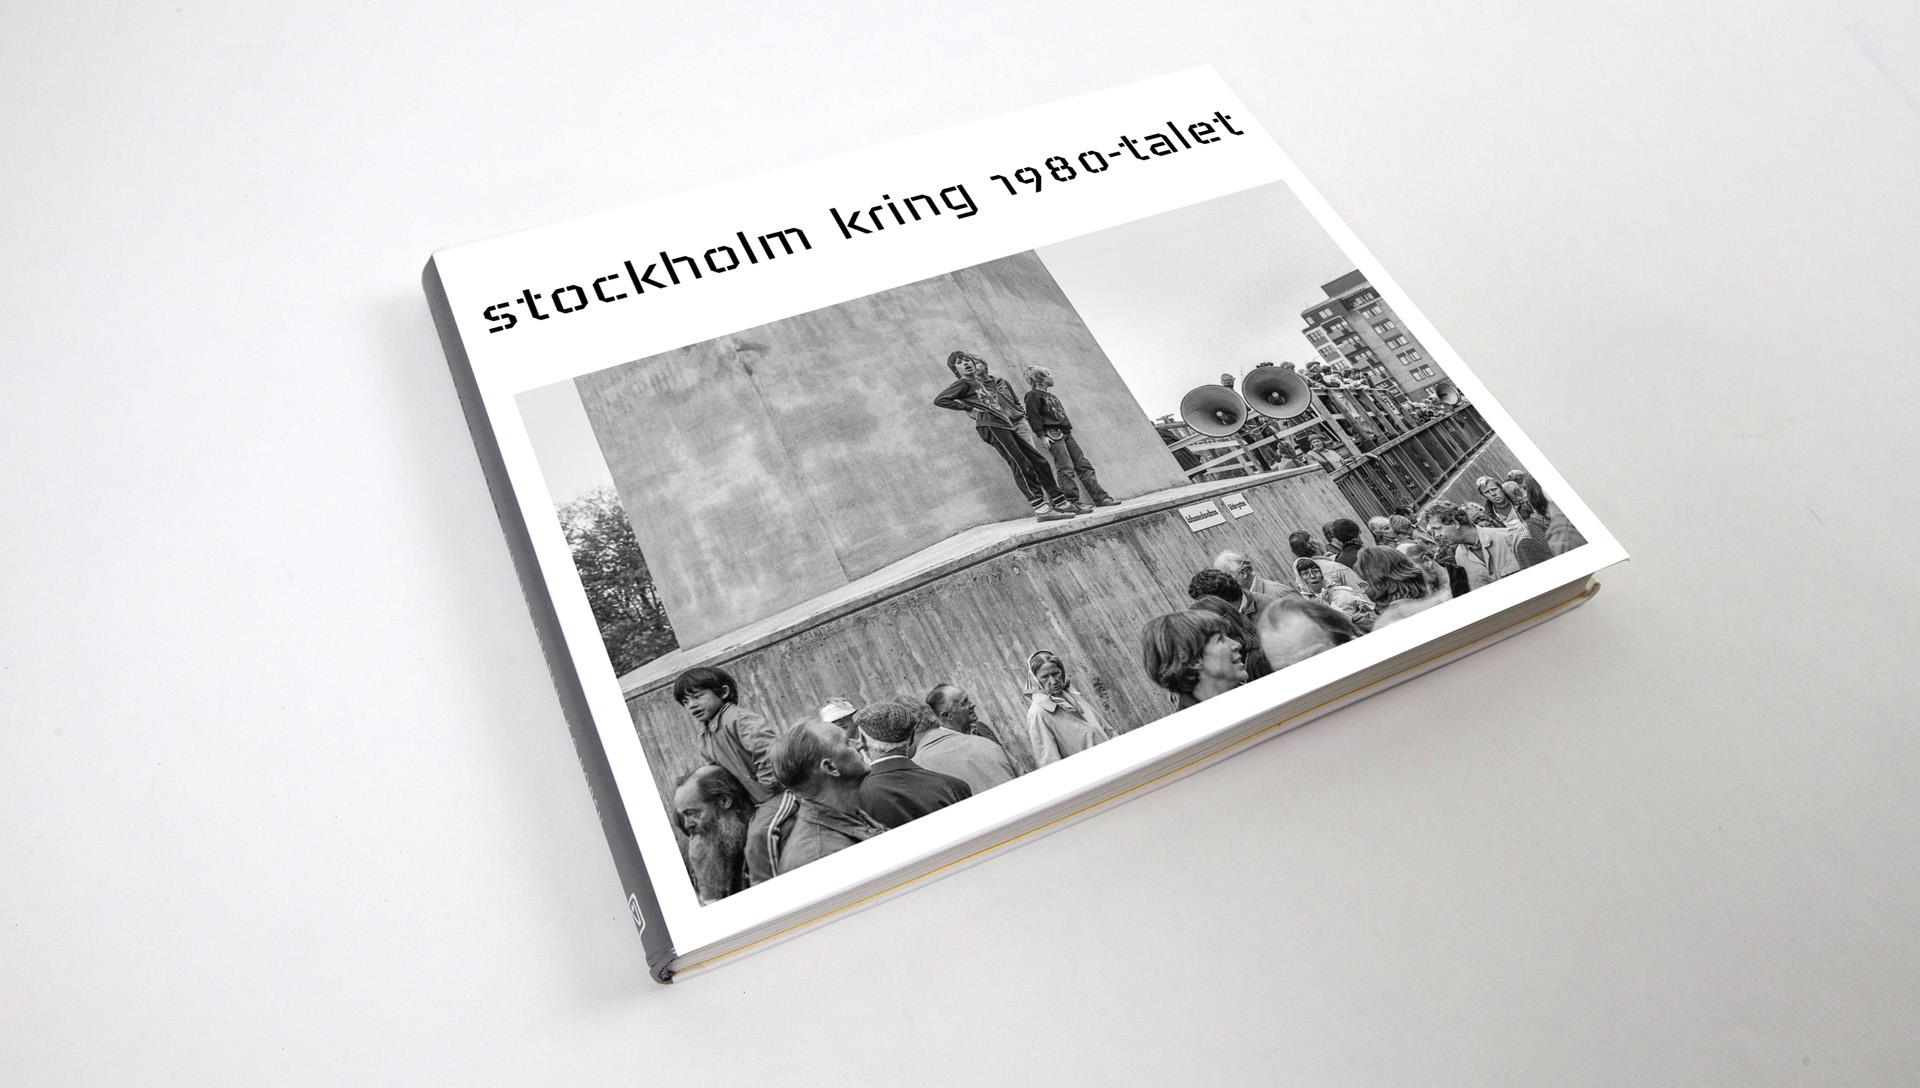 Stockholm 1980a